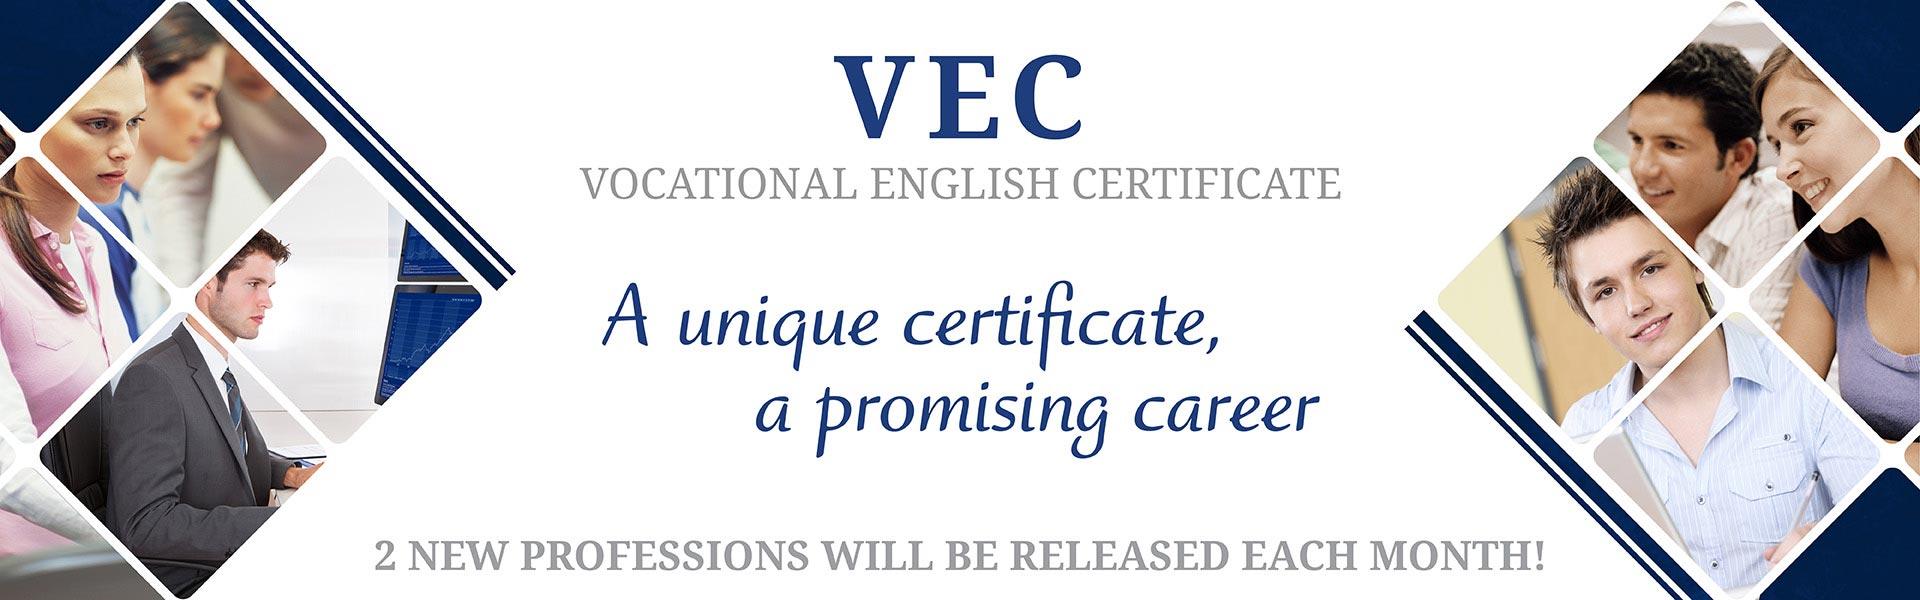 International Vocational English